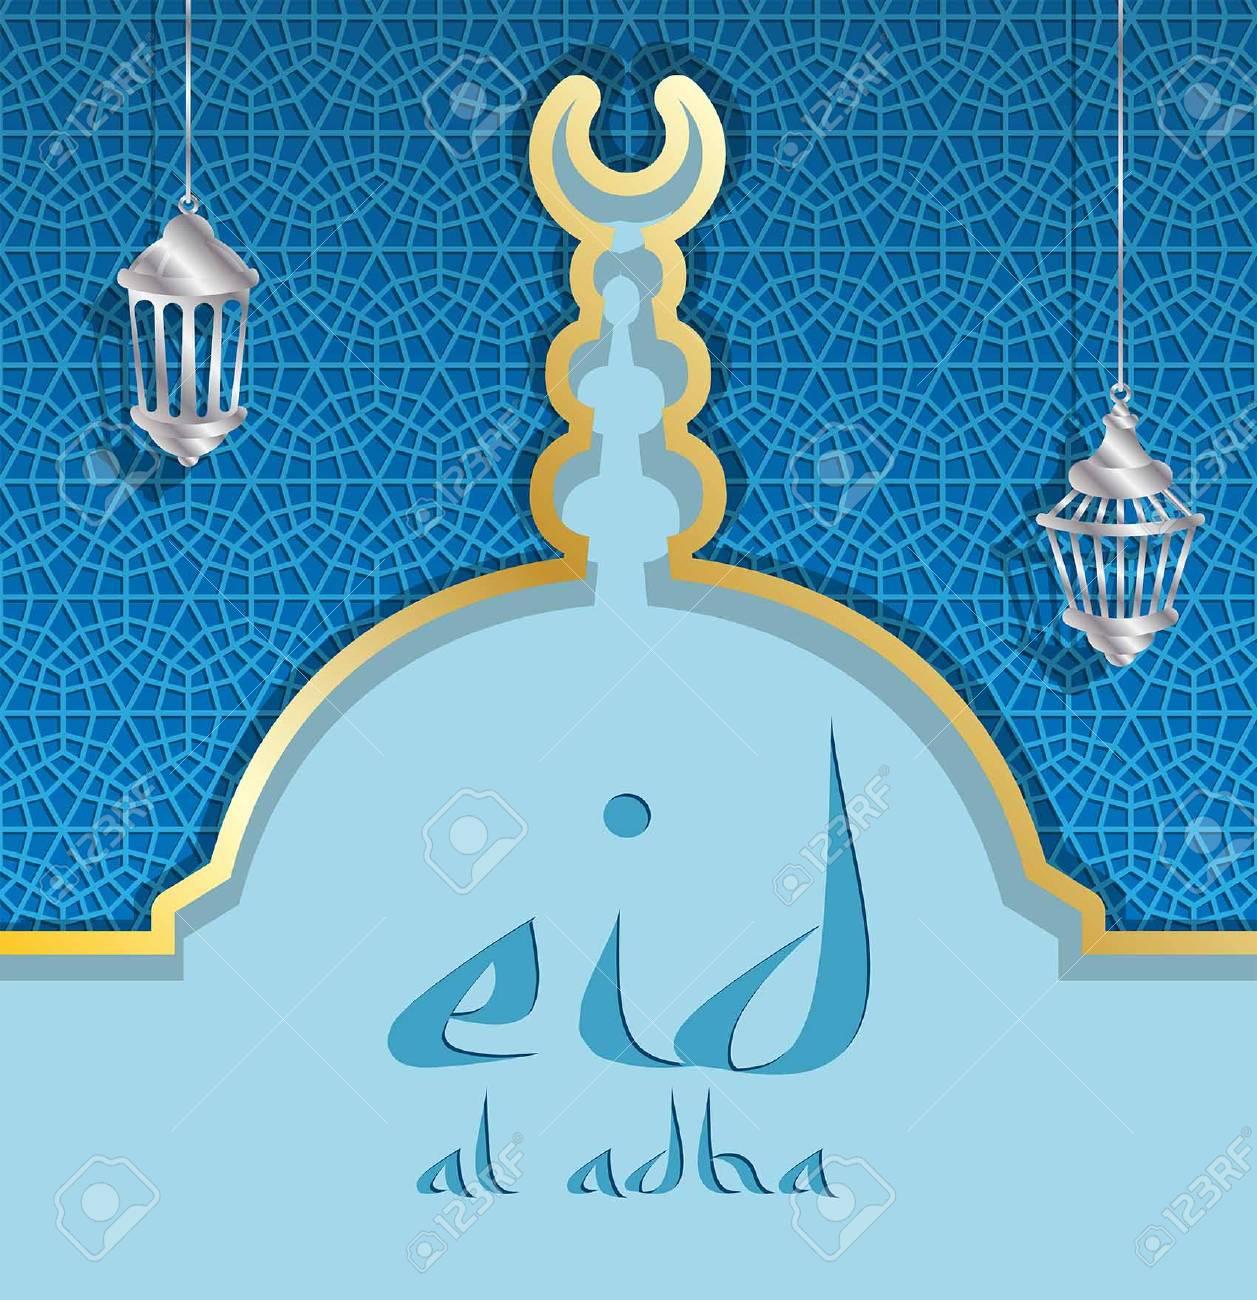 Eid al adha greeting card with a blue mosque dome and lanterns eid al adha greeting card with a blue mosque dome and lanterns all the objects m4hsunfo